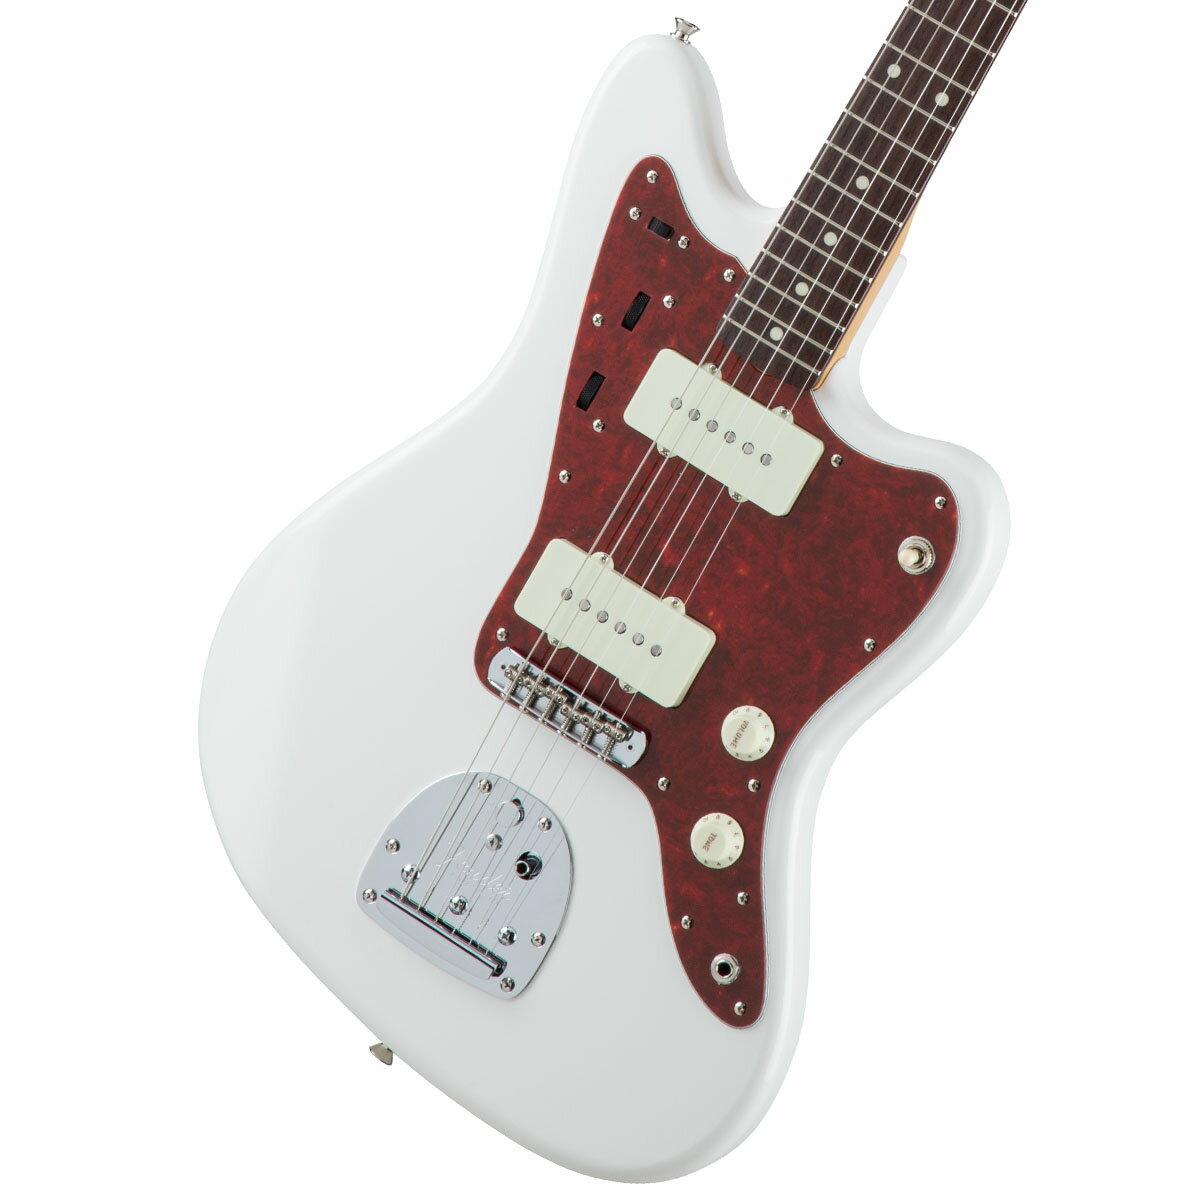 Fender / Made in Japan Traditional 60s Jazzmaster Rosewood Fingerboard Arctic White 《カスタムショップのお手入れ用品を進呈/+671038200》【YRK】